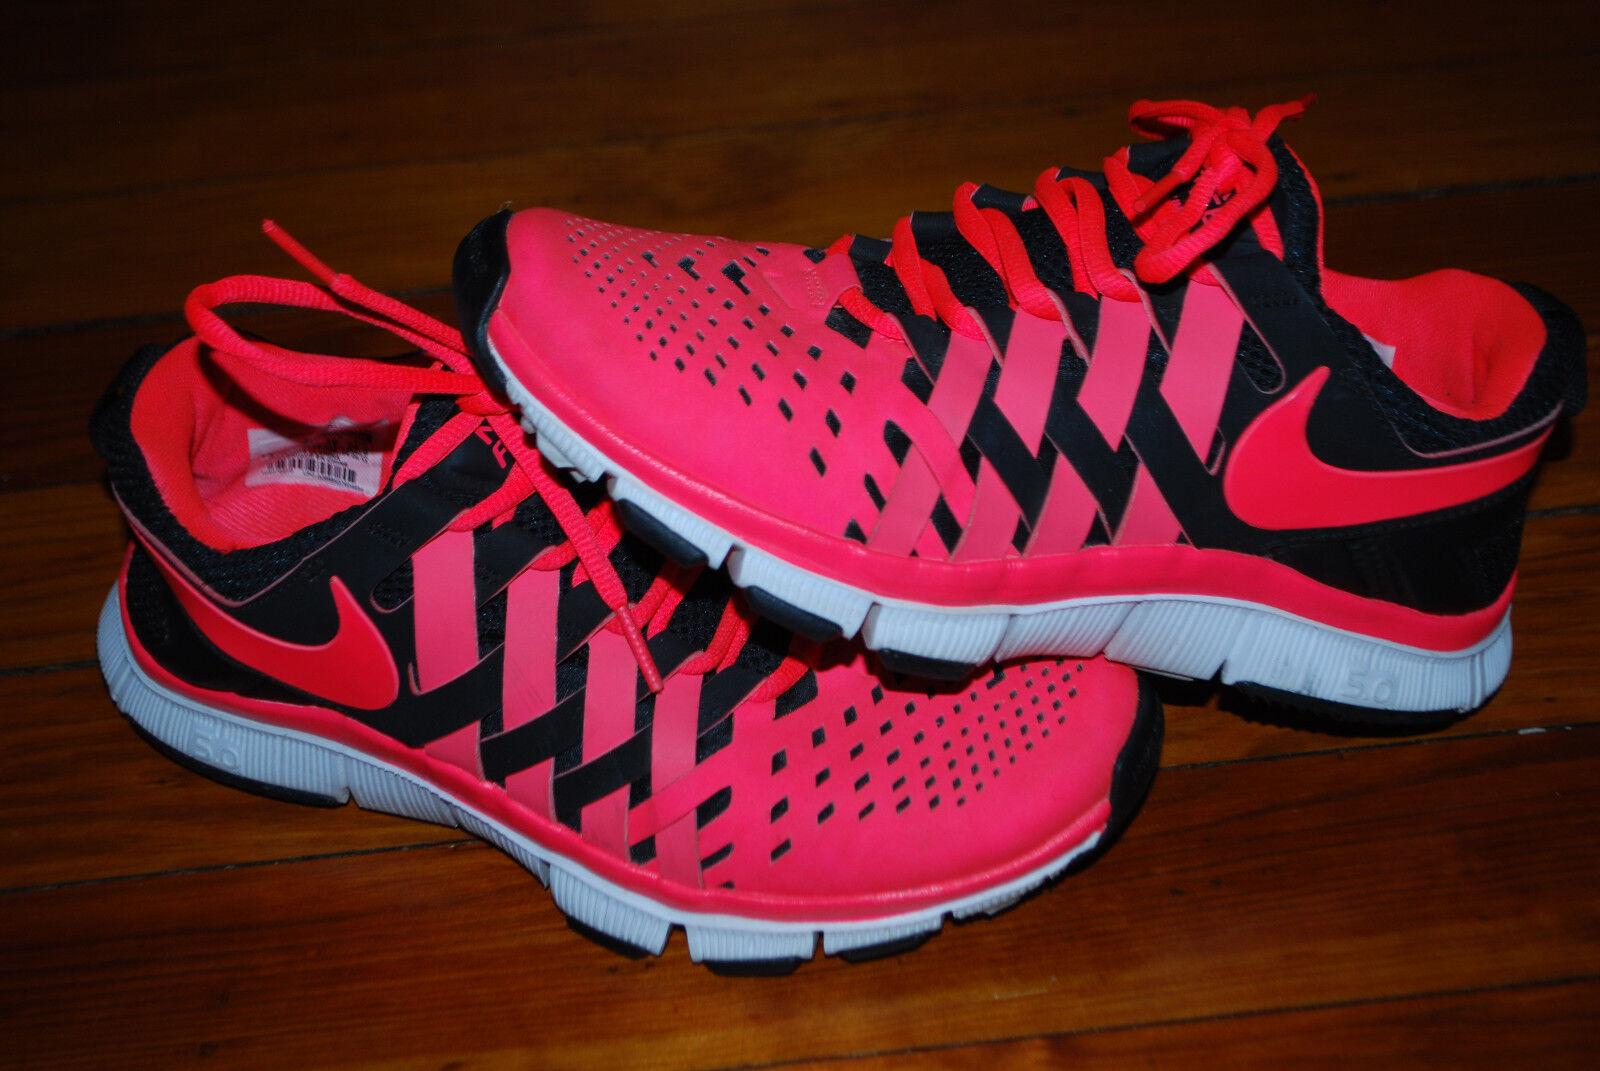 Men's Nike Free Trainer 5 0 Weave Sneakers / (6.5) White / Black / Sneakers Atomic Red 7b2303